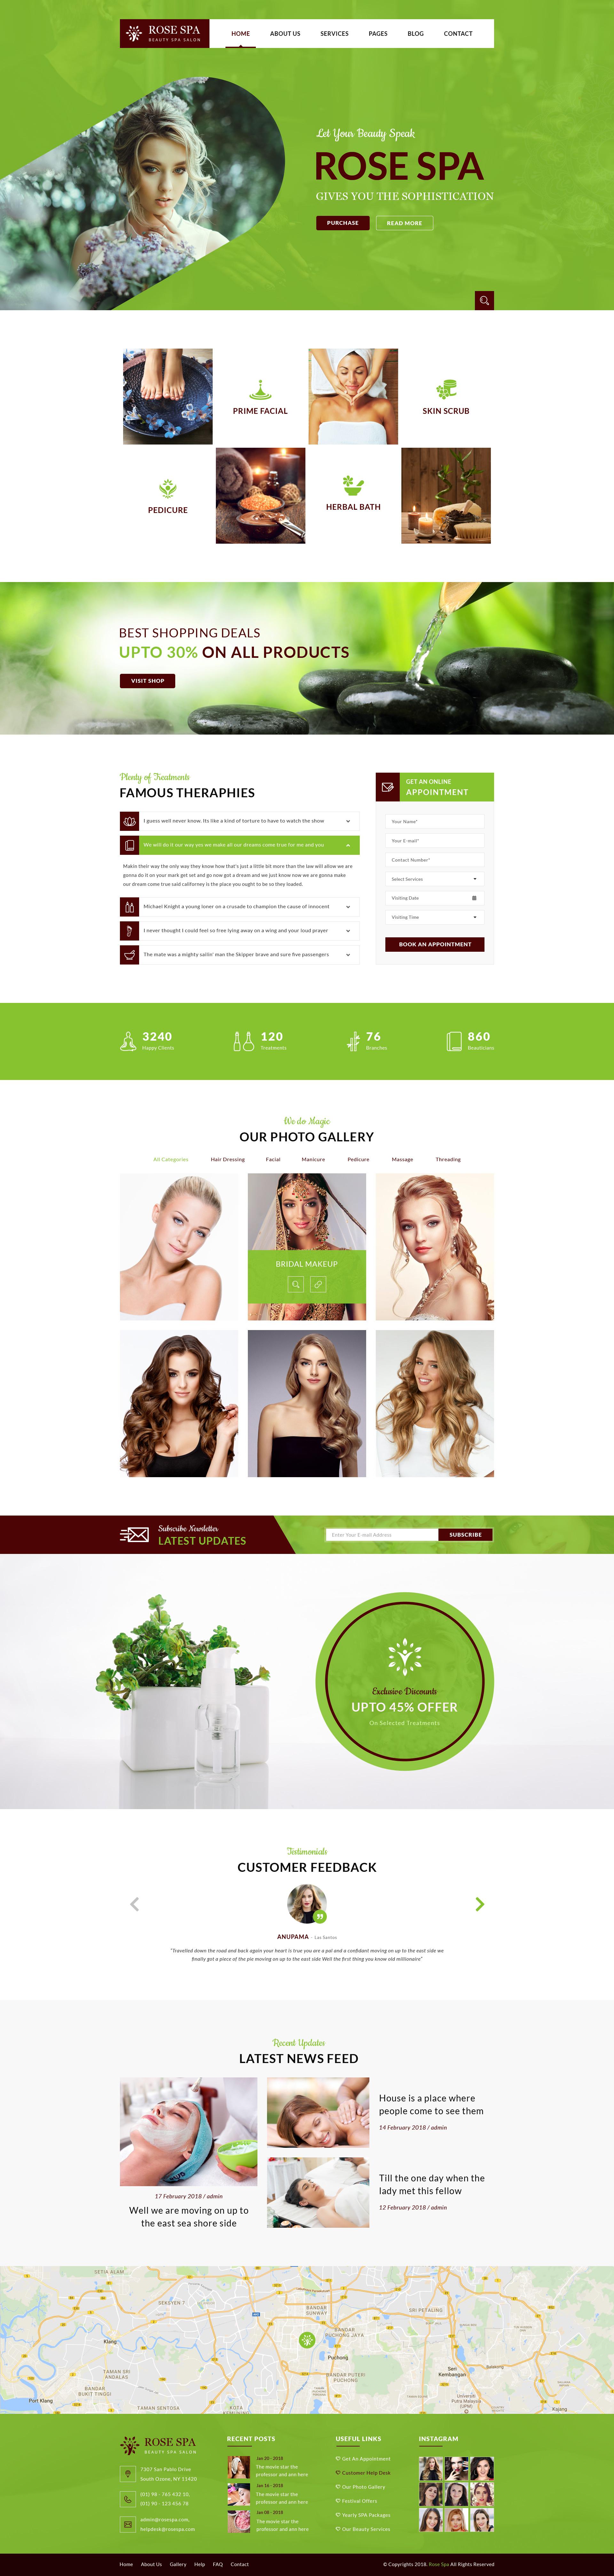 Rose SPA - Beauty SPA Salon PSD Web Template